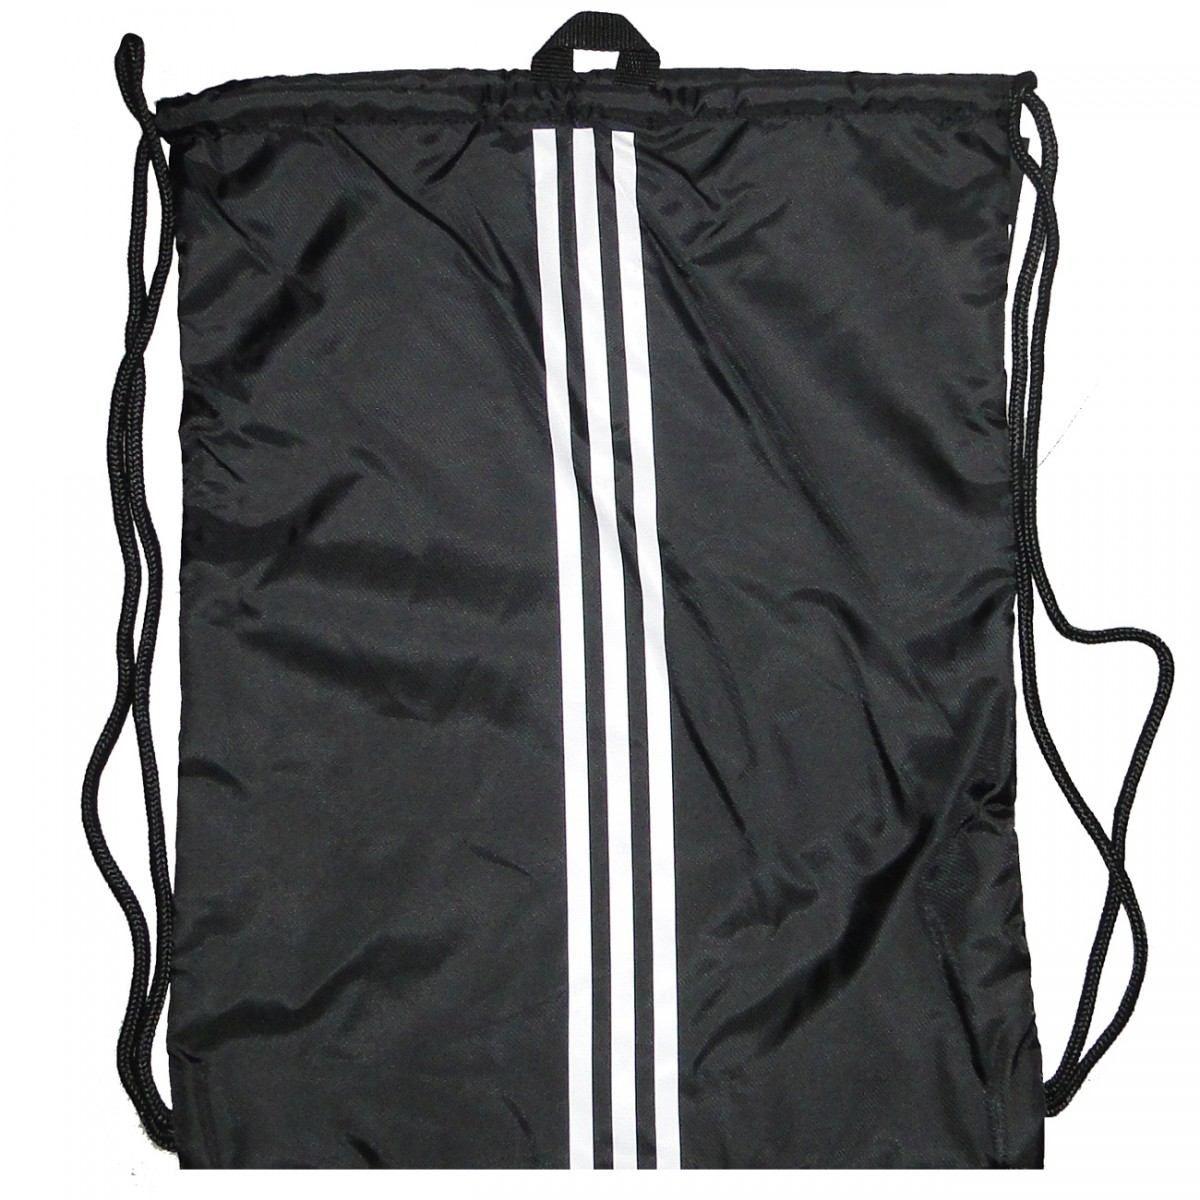 Bolsa Adidas Tiro GB - Preto